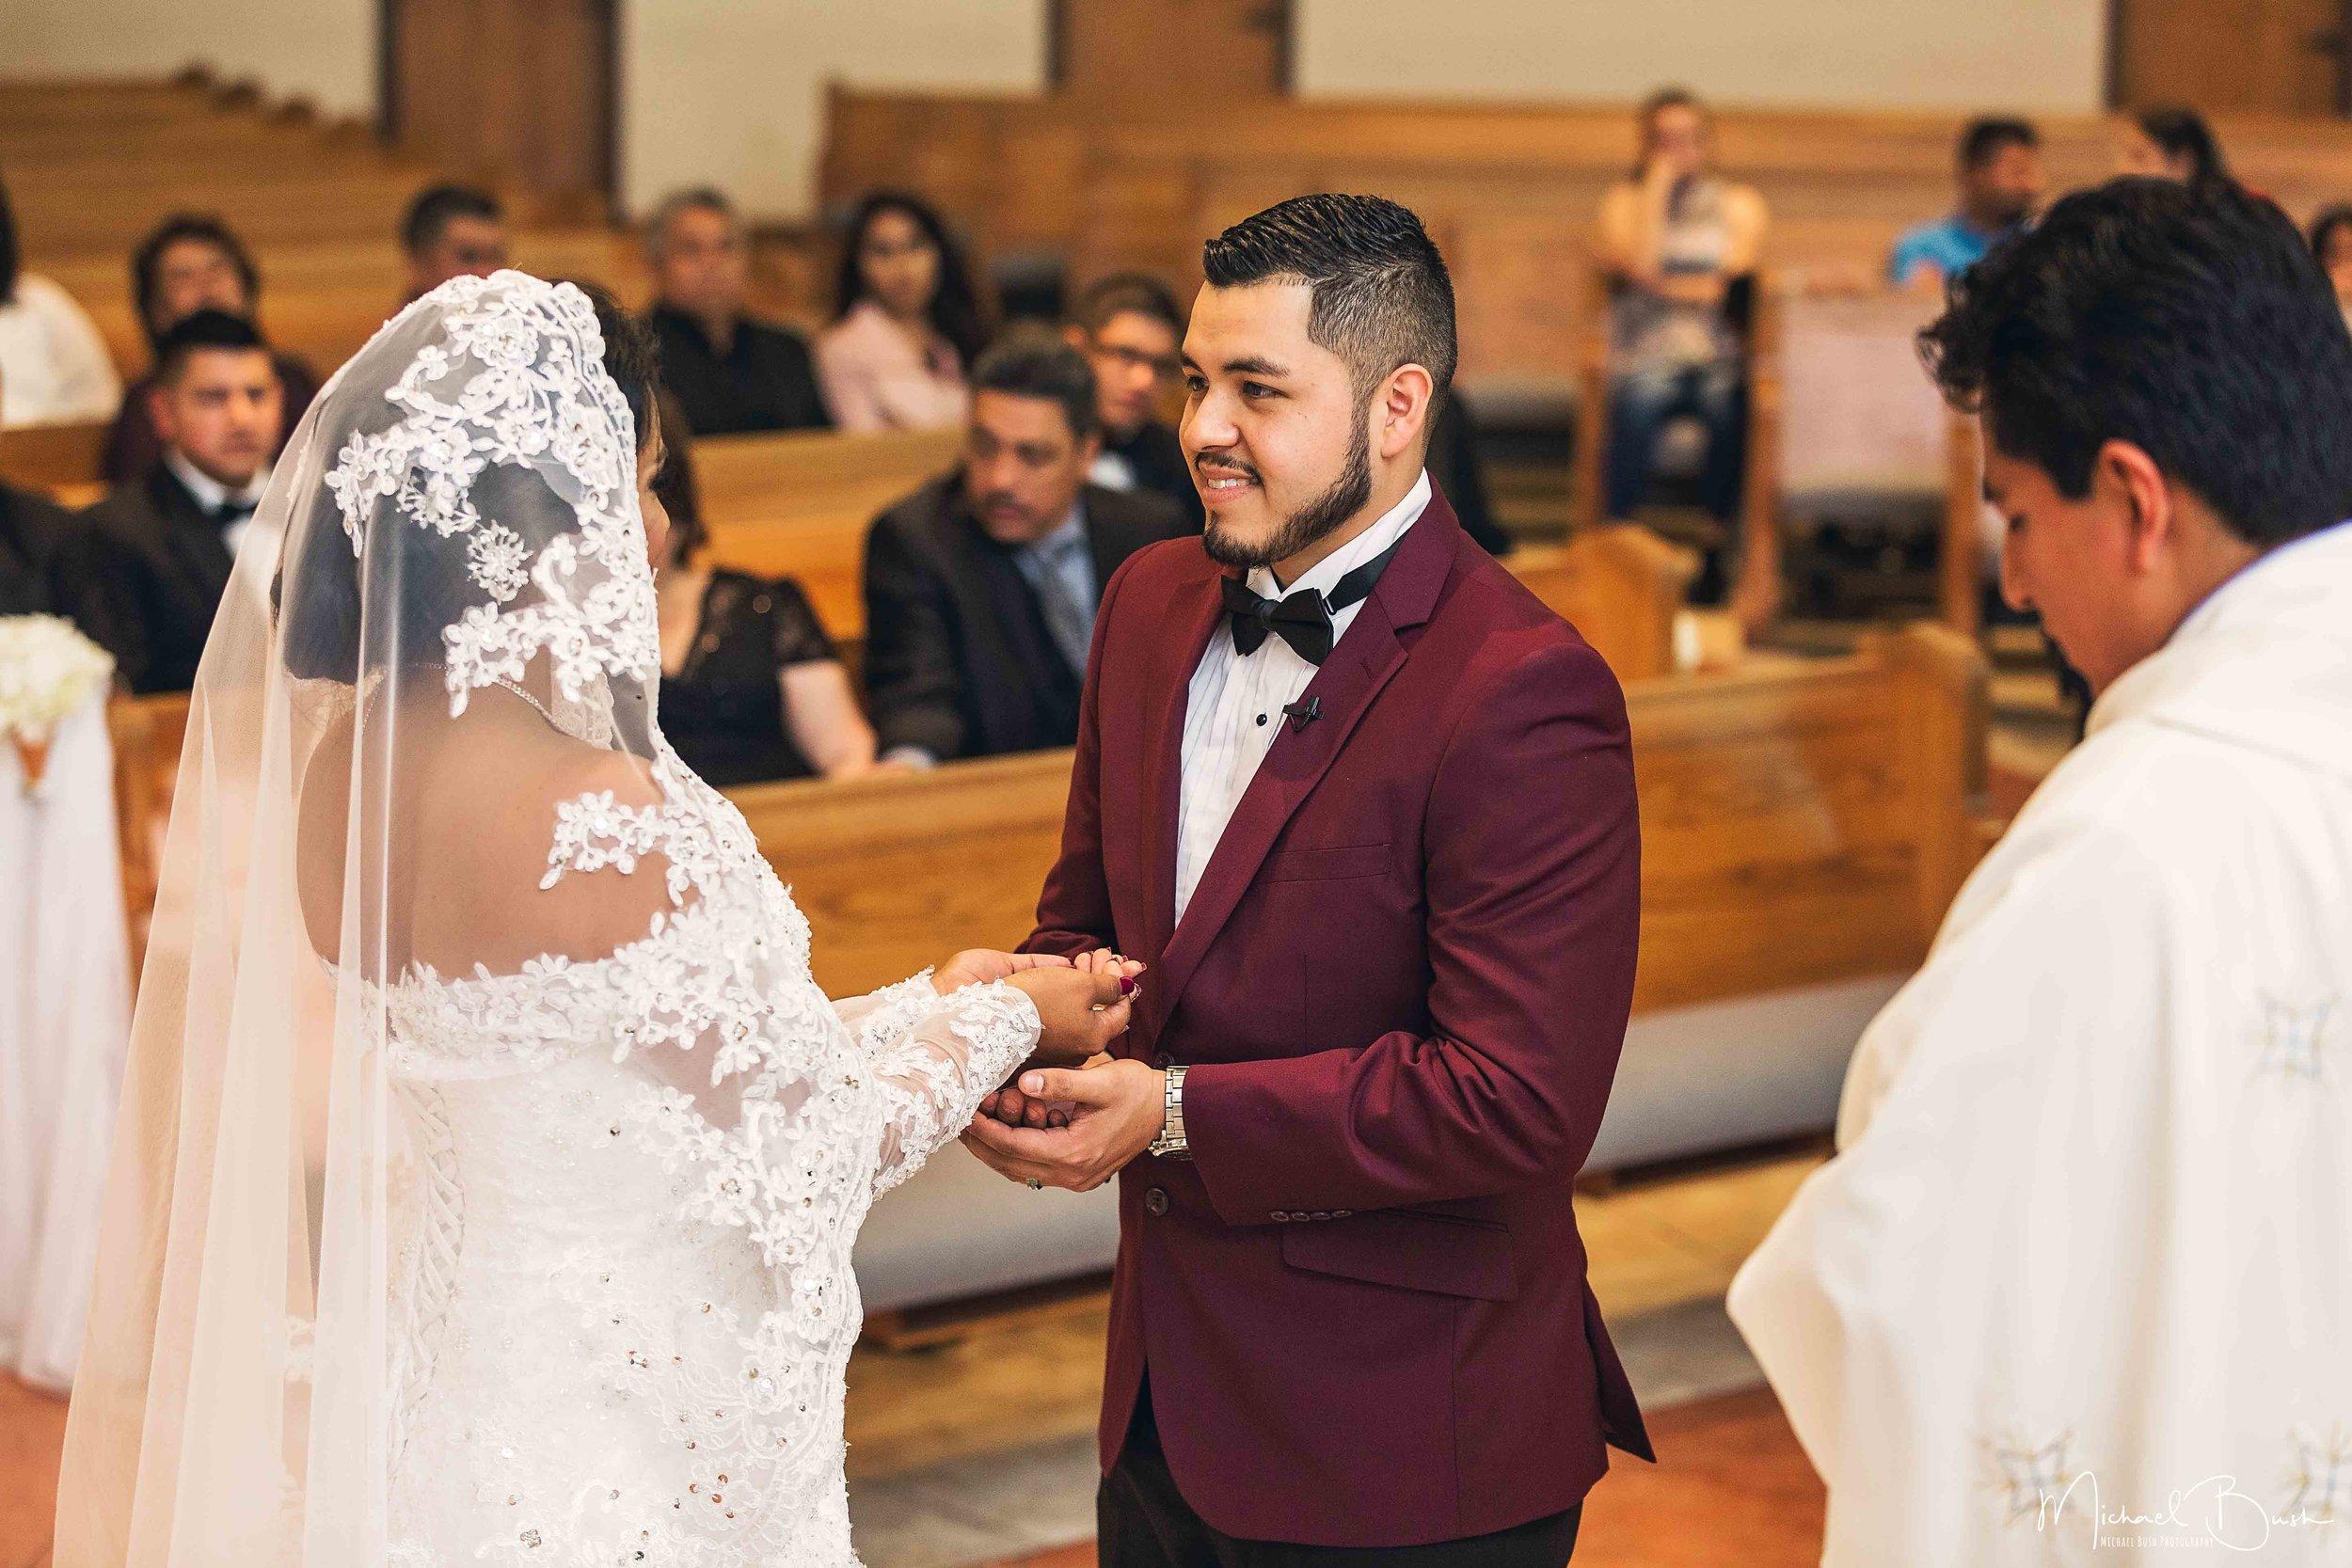 Wedding-Details-Bride-Fort Worth-colors-Ceremony-weddingceremony-brides-groom-ido-church-rituals.jpg